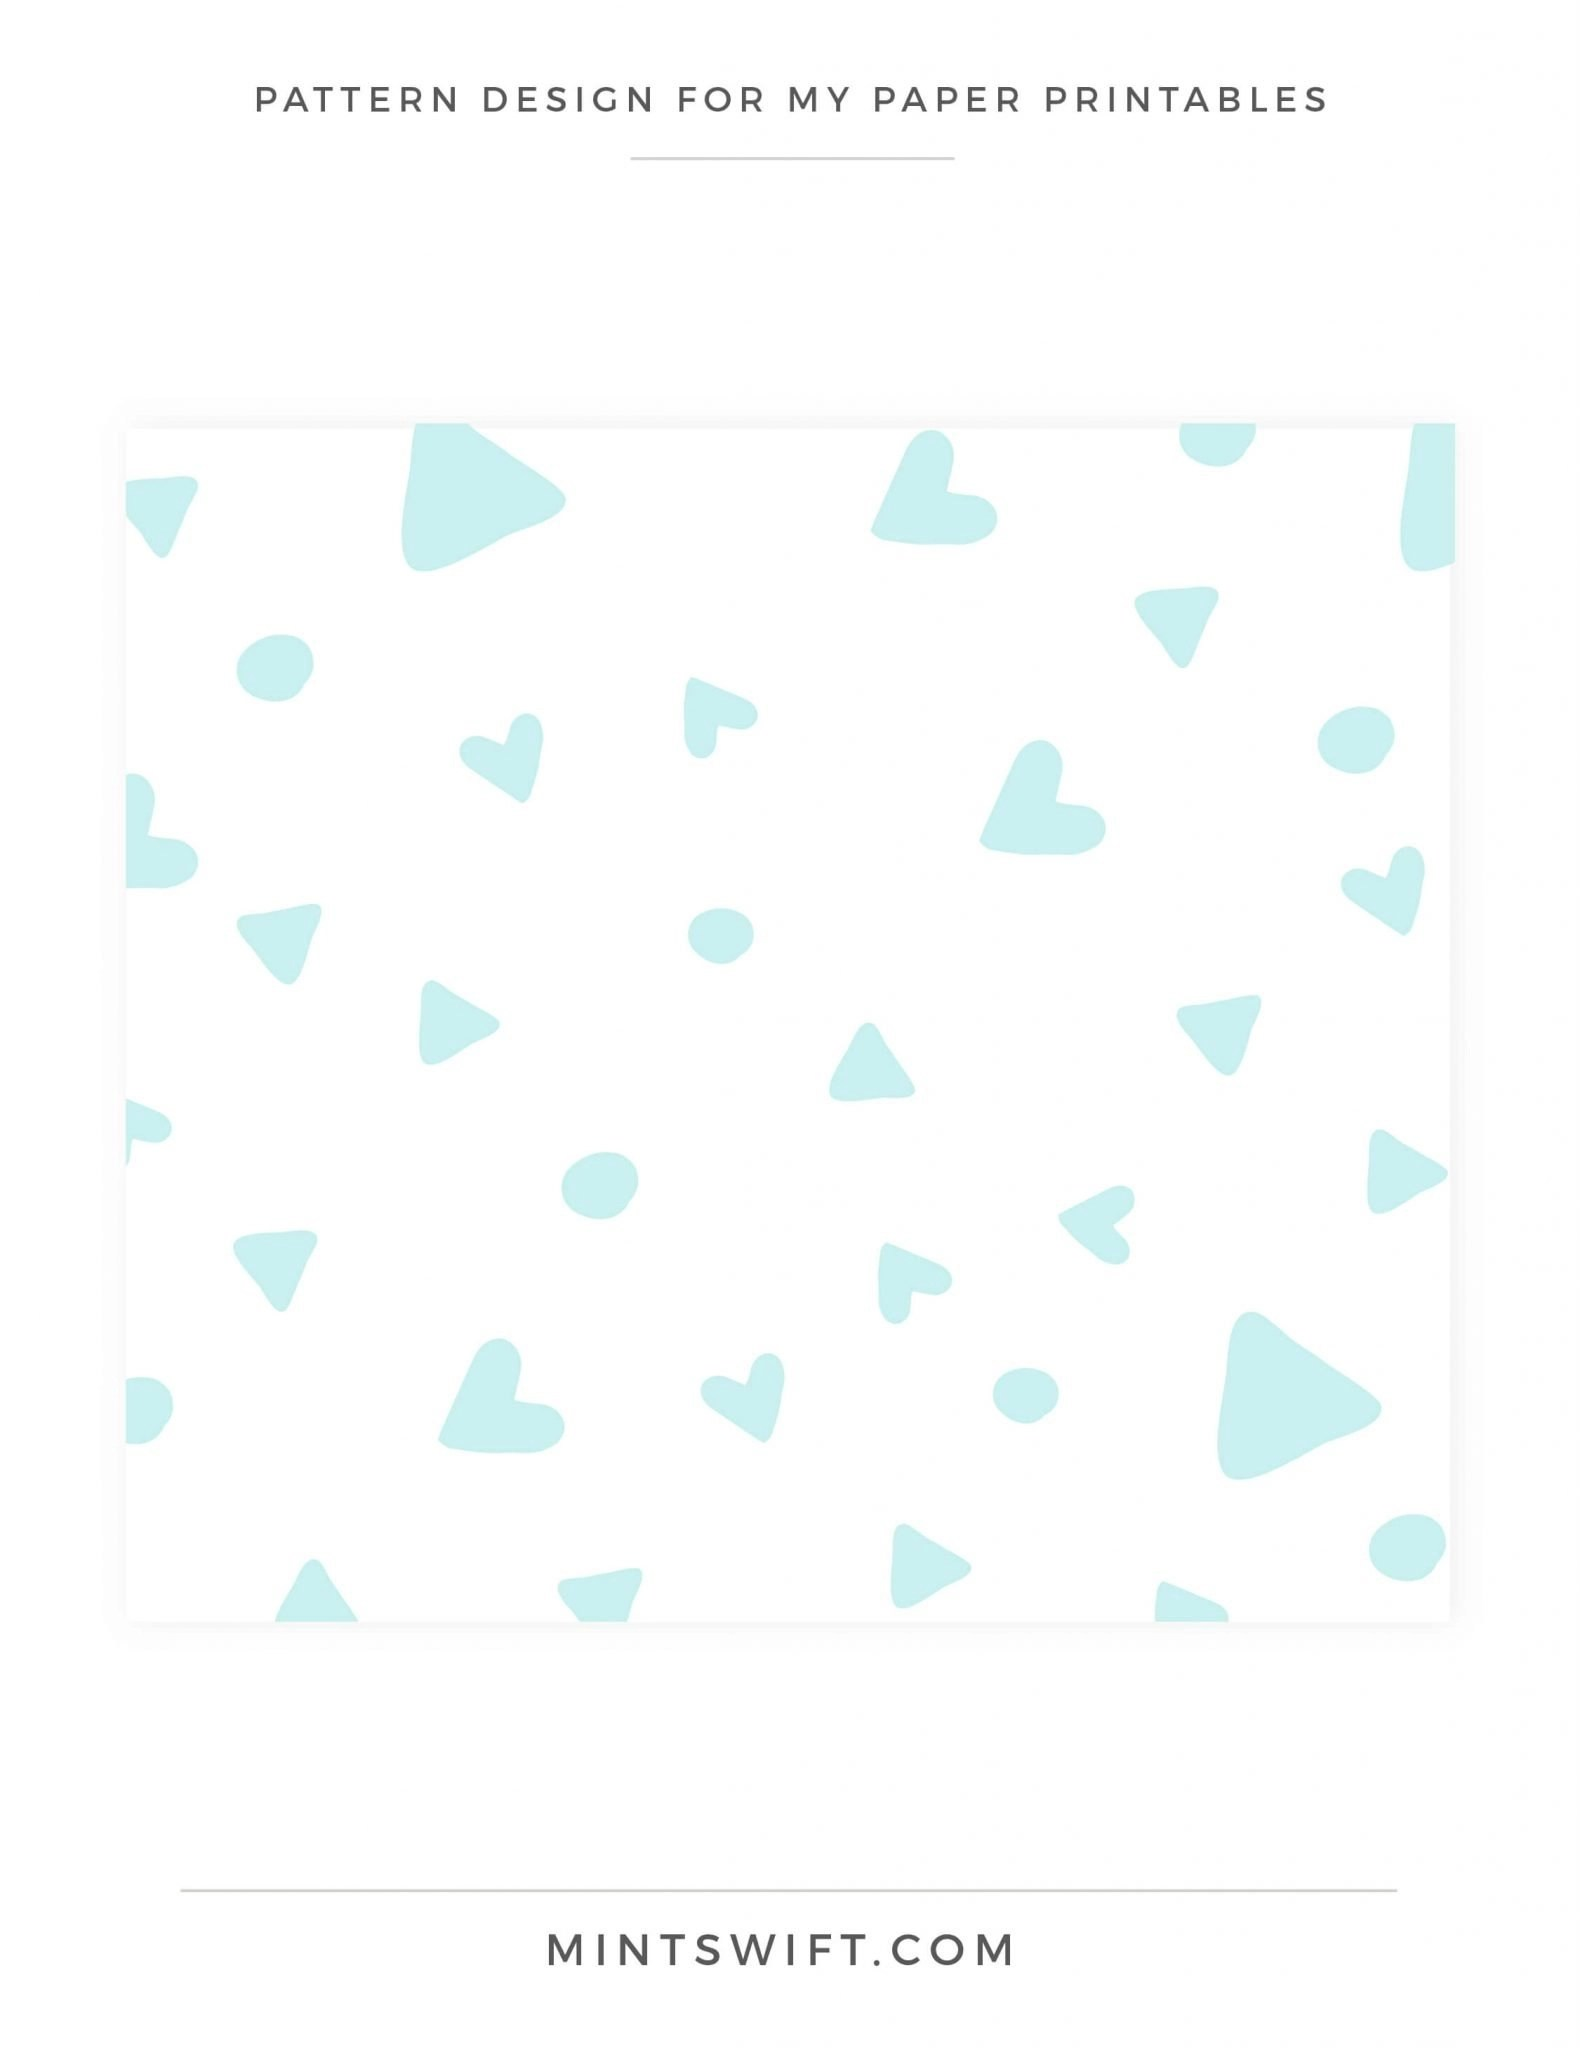 My Paper Printables - Pattern Design - Brand Design - MintSwift